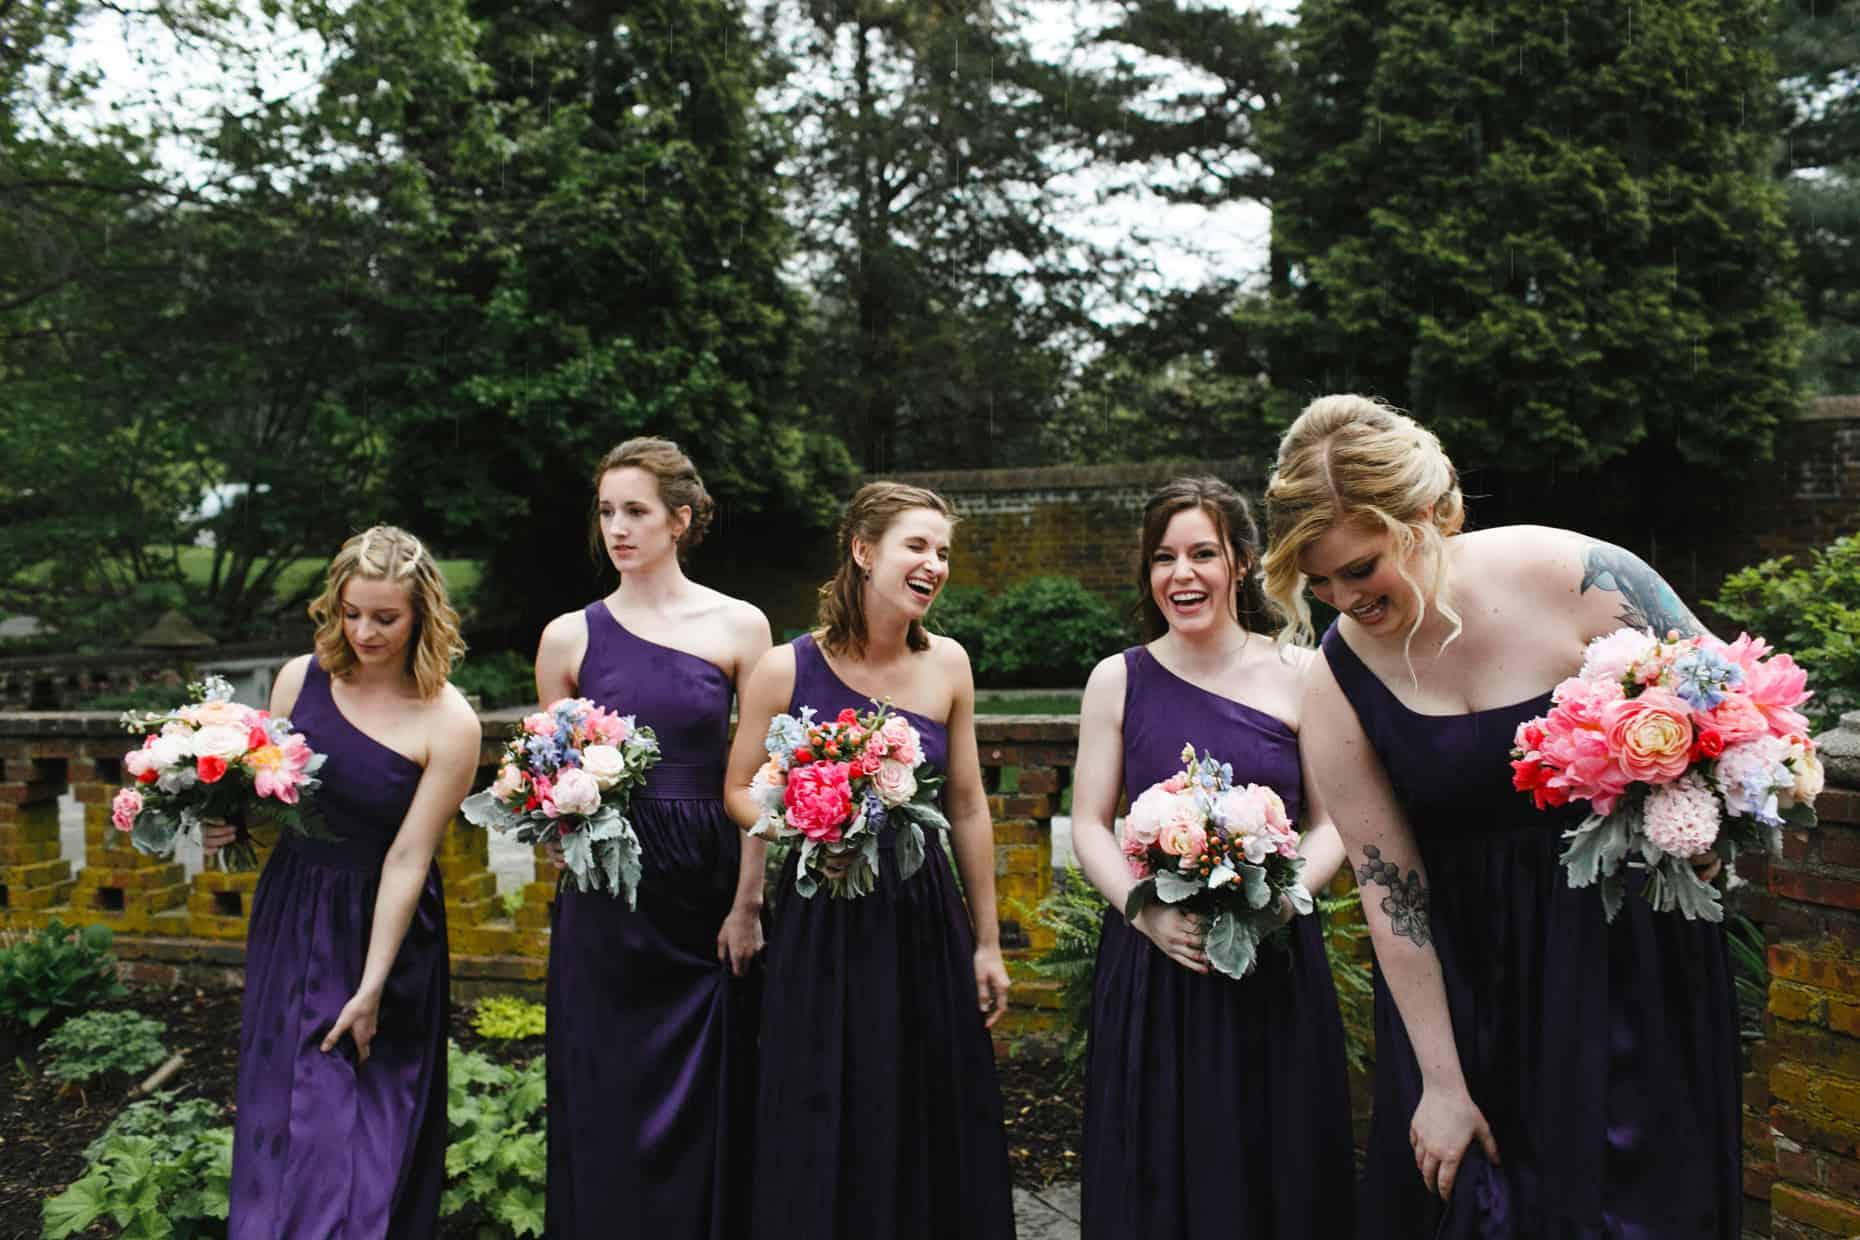 Bucks County Mansion Wedding Photo